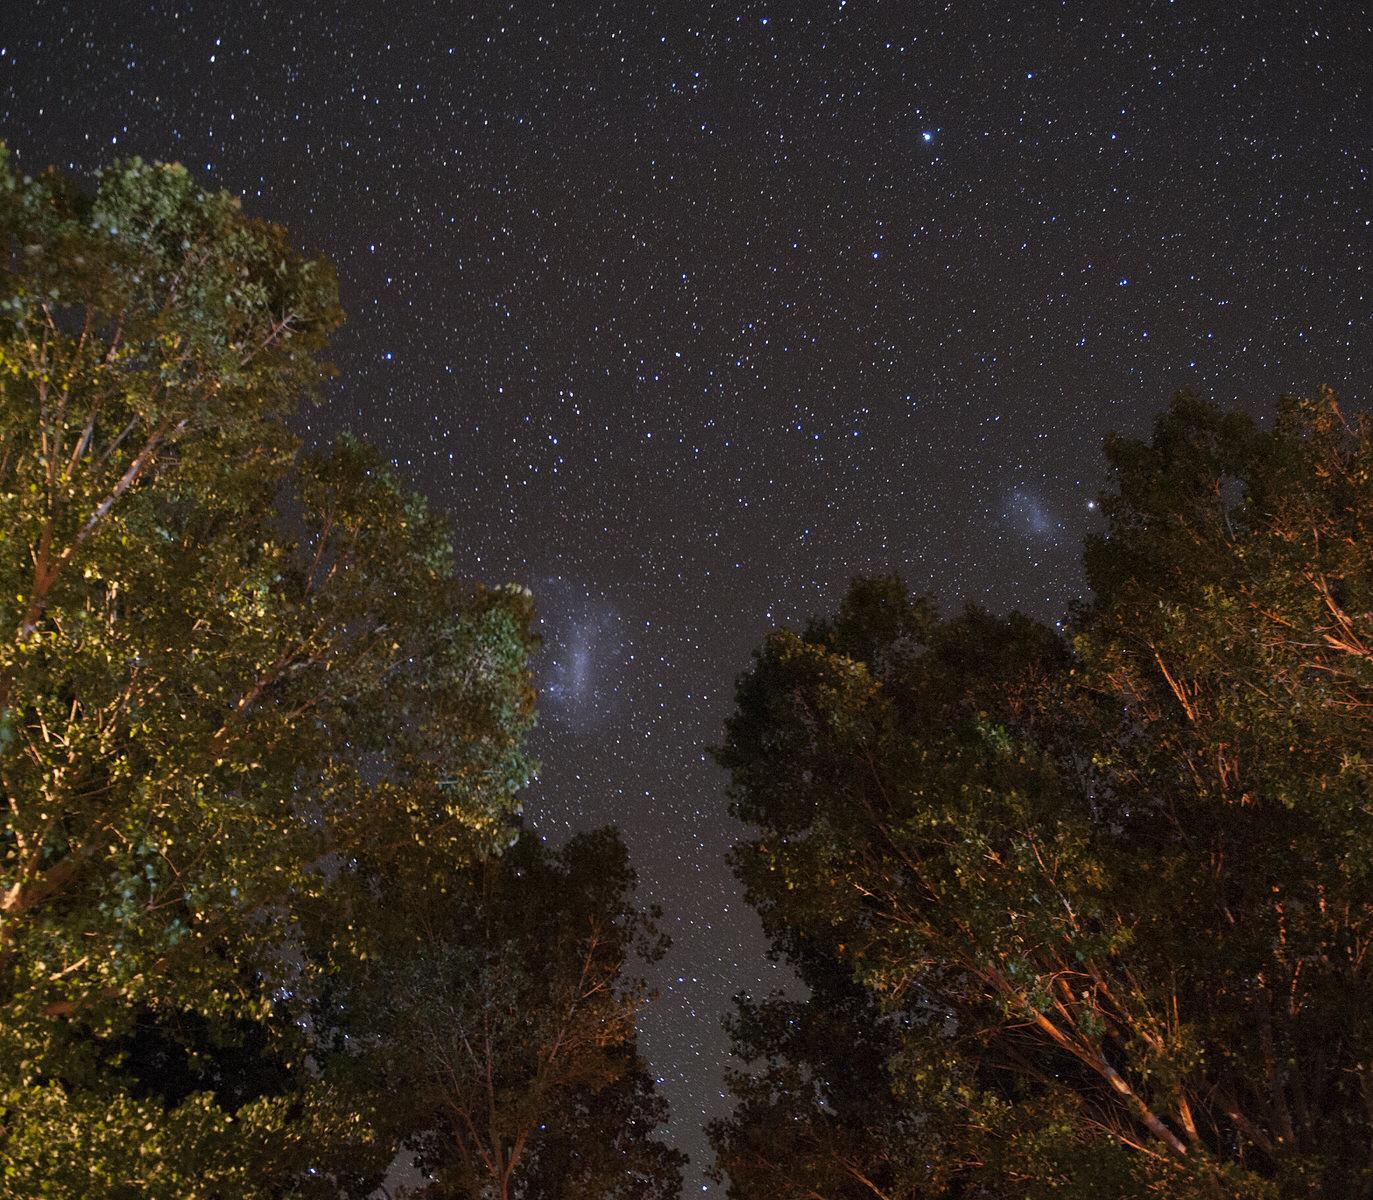 Starry night sky above the trees, Karoo, South Africa_photo by Heine Wieben Rasmussen, Bliss & Stars.jpg